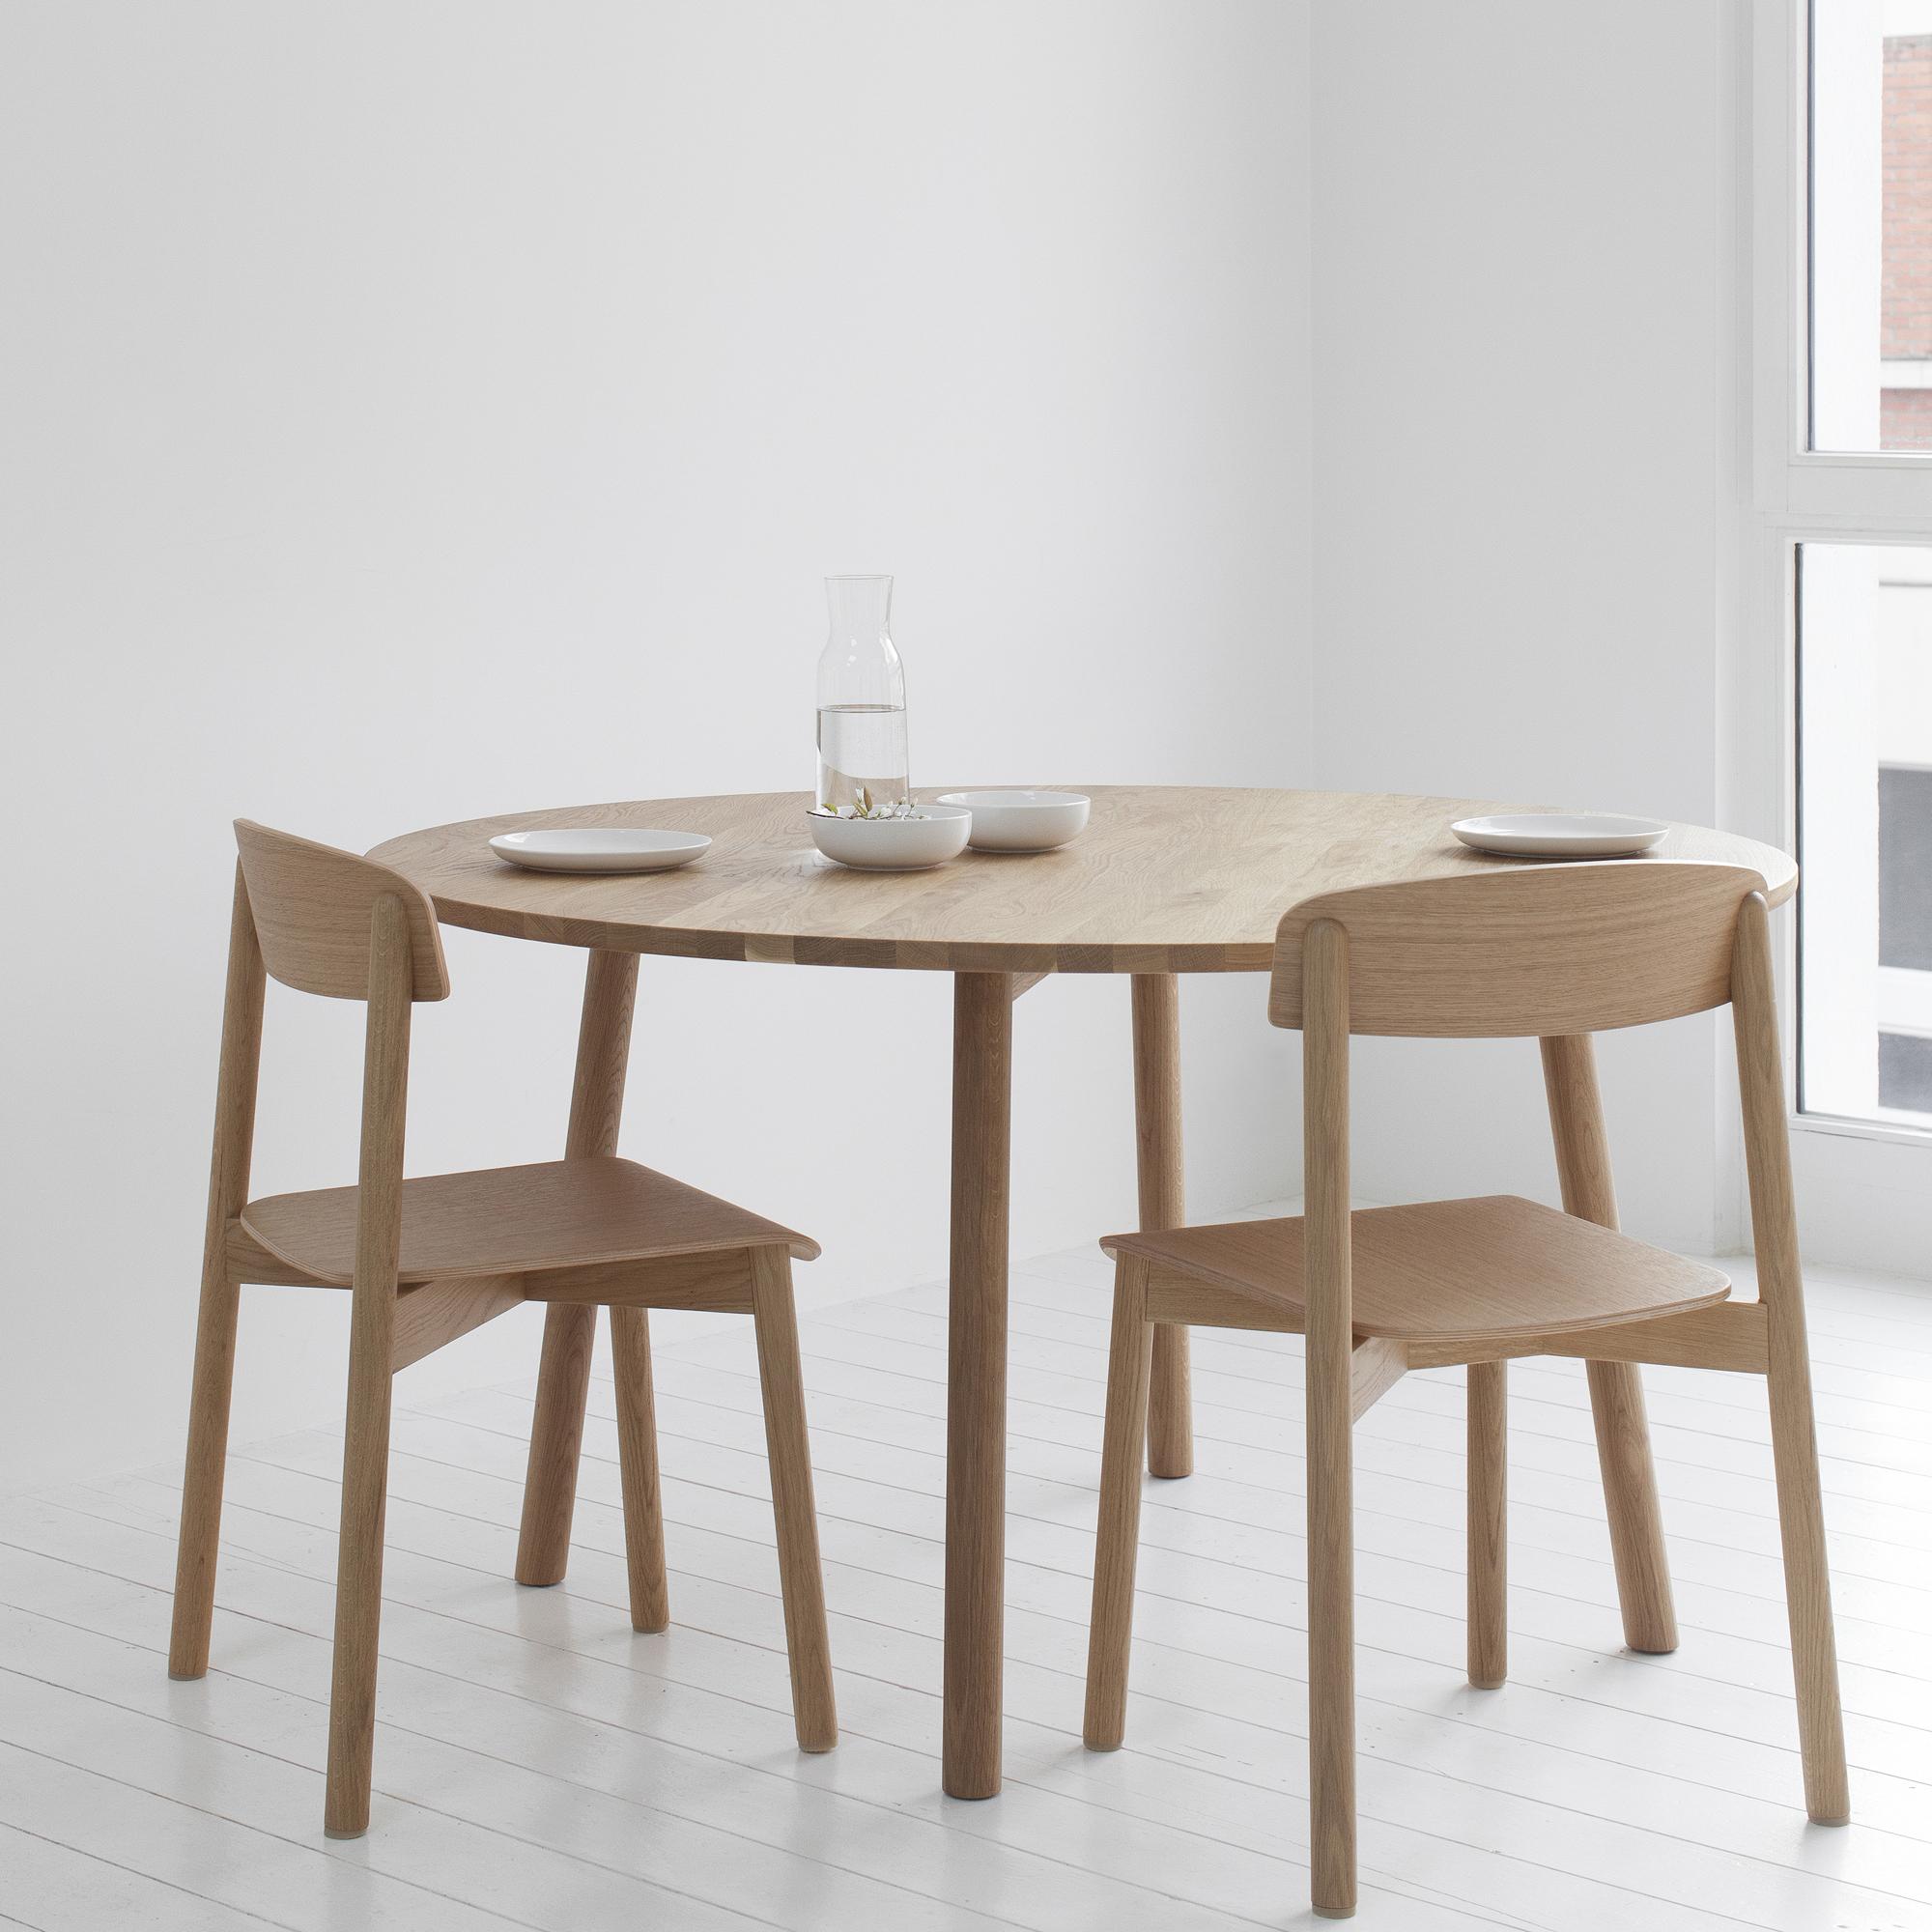 runder profile table von stattmann i holzdesignpur. Black Bedroom Furniture Sets. Home Design Ideas